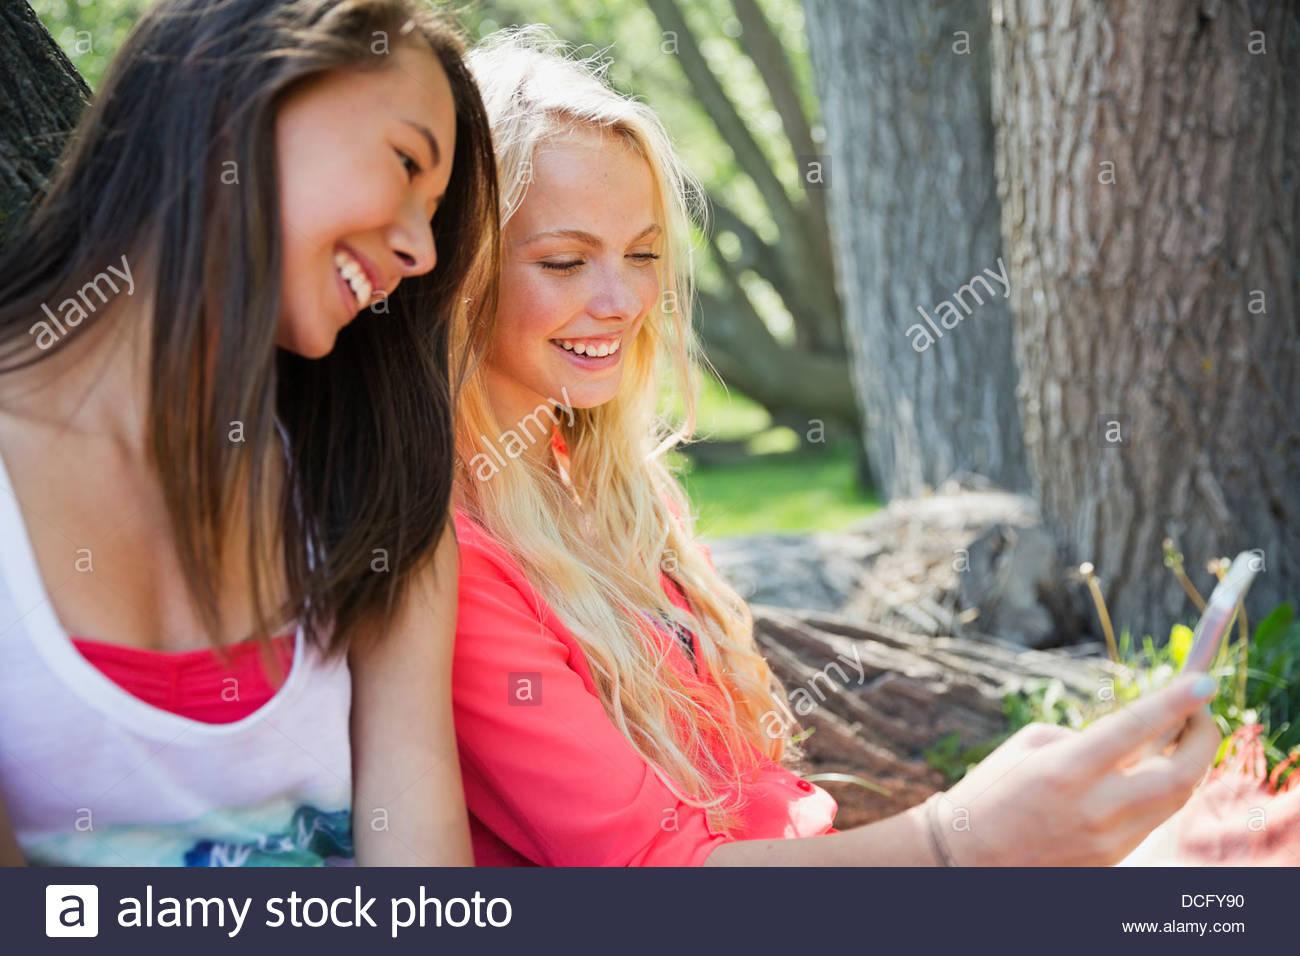 Teenage girls taking self-portrait at park - Stock Image